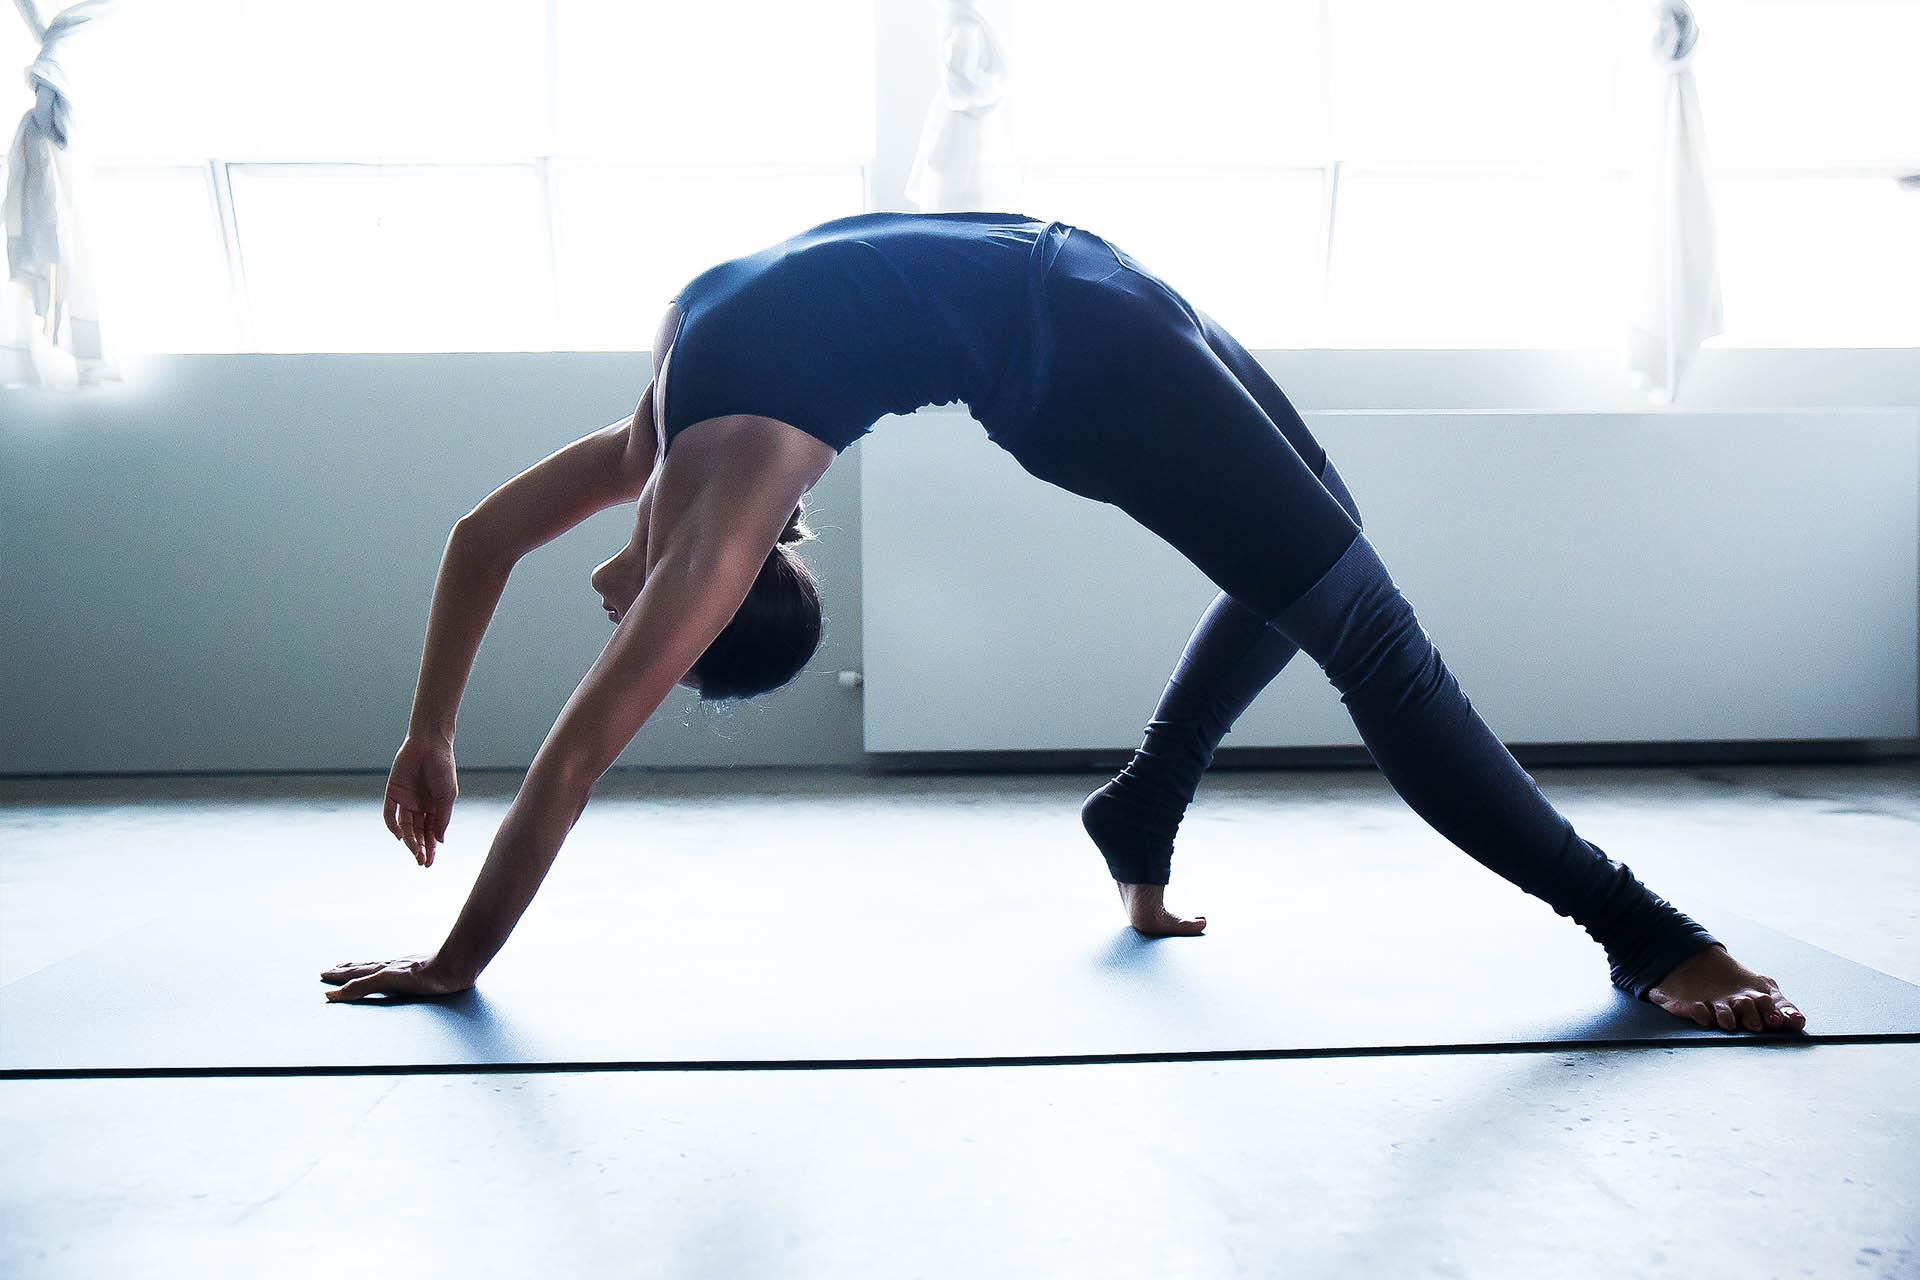 Melbourne One Hot Yoga Bianca Cheah